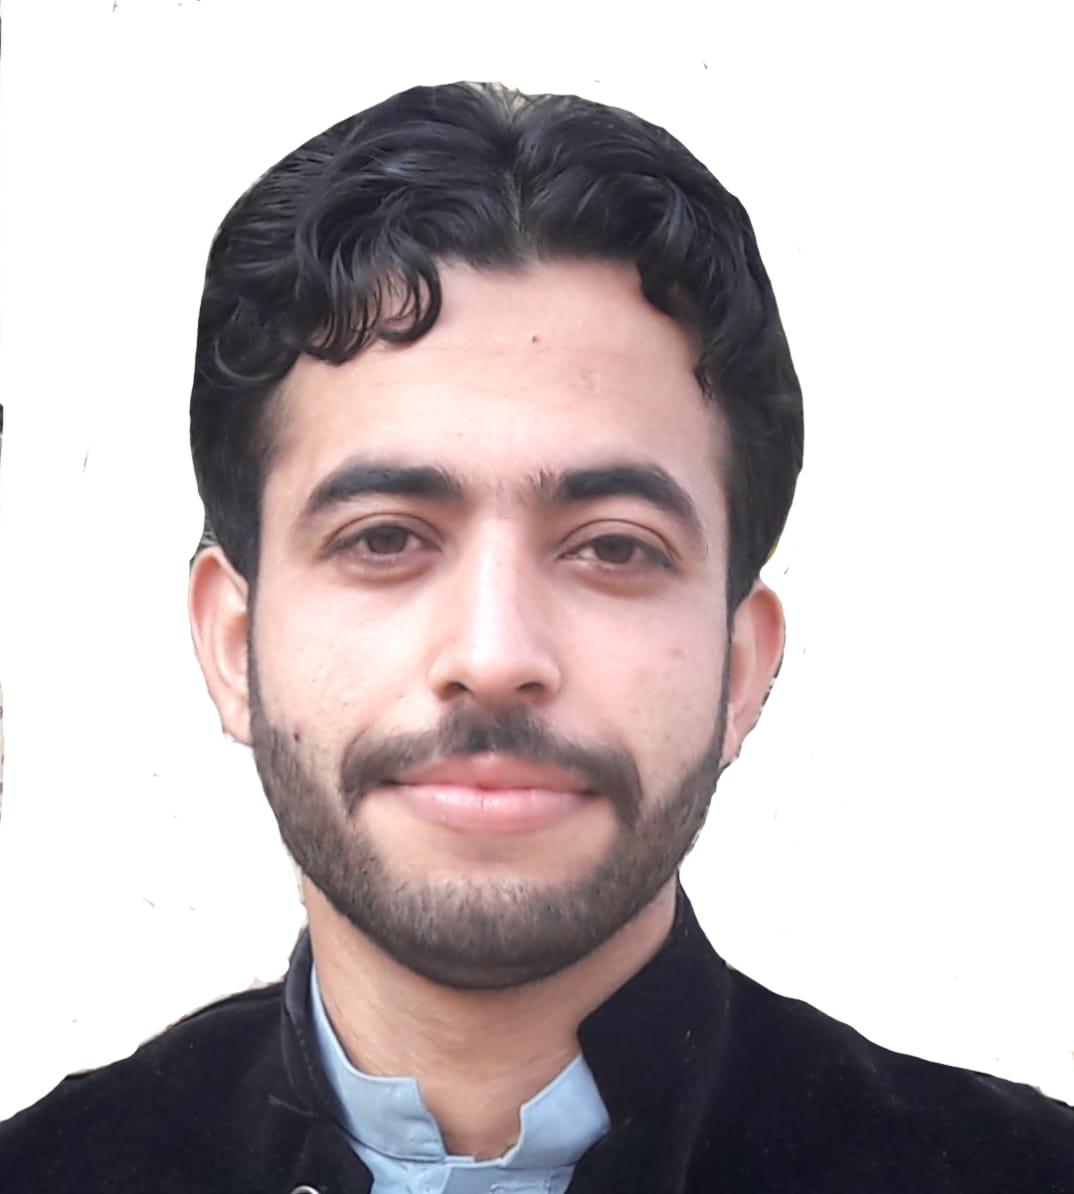 Muhammad Umar Excel, Video Upload, Electrical Engineering, AutoCAD, Circuit Design